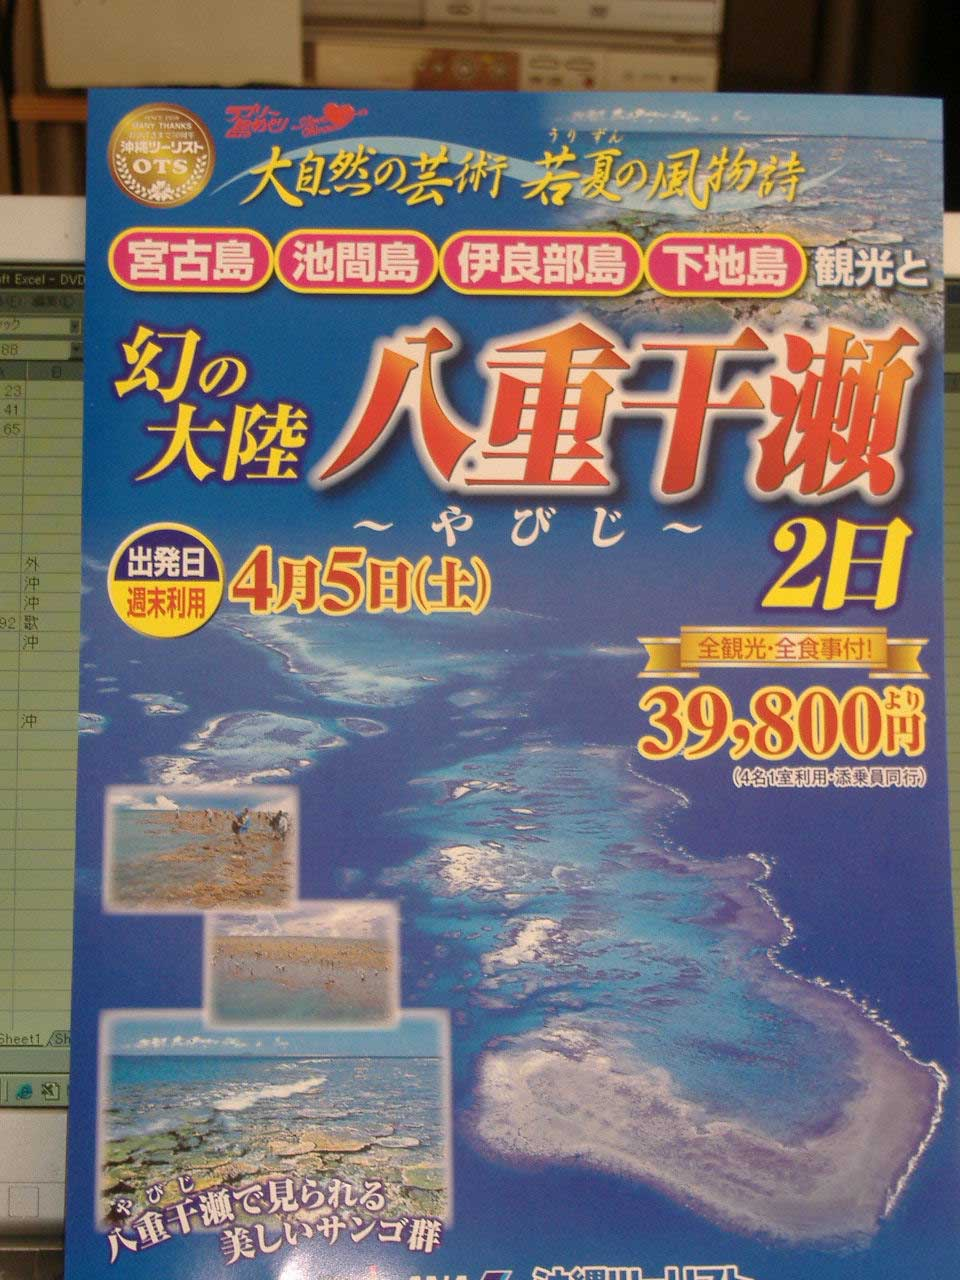 blog八重干瀬パンフレット0803090021.jpg